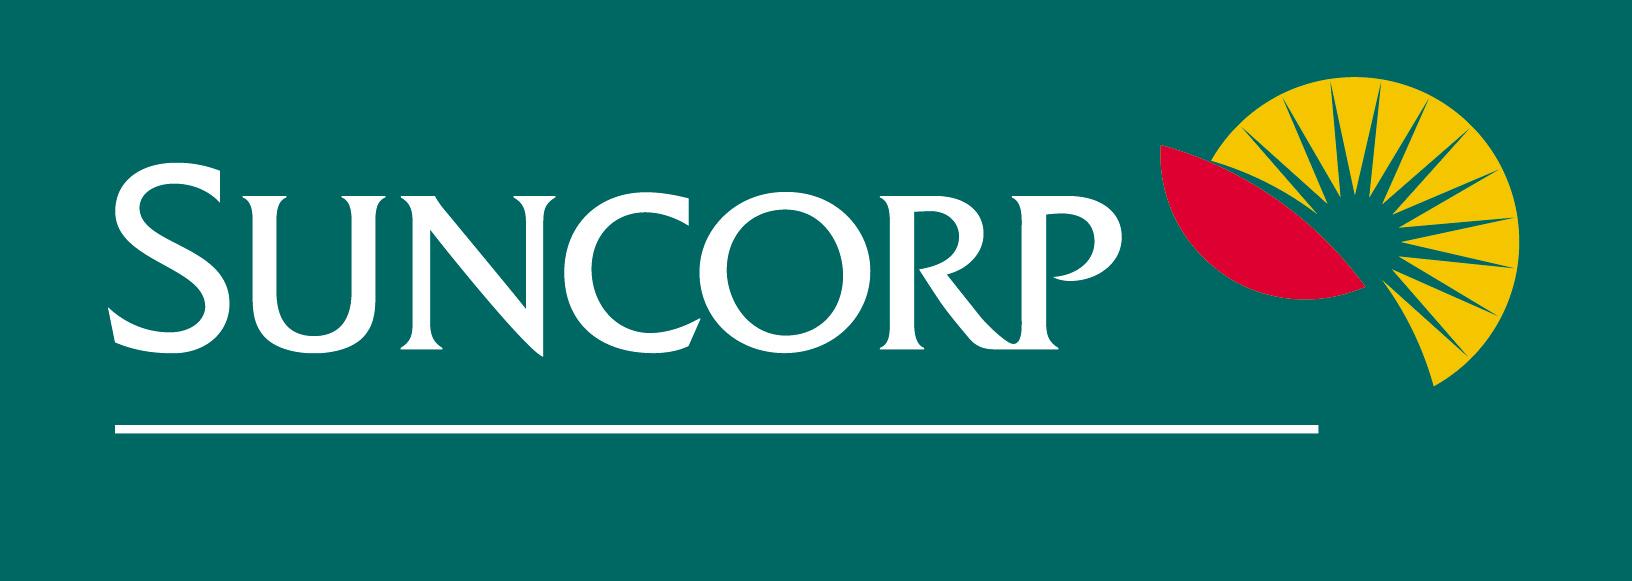 suncorp-logo